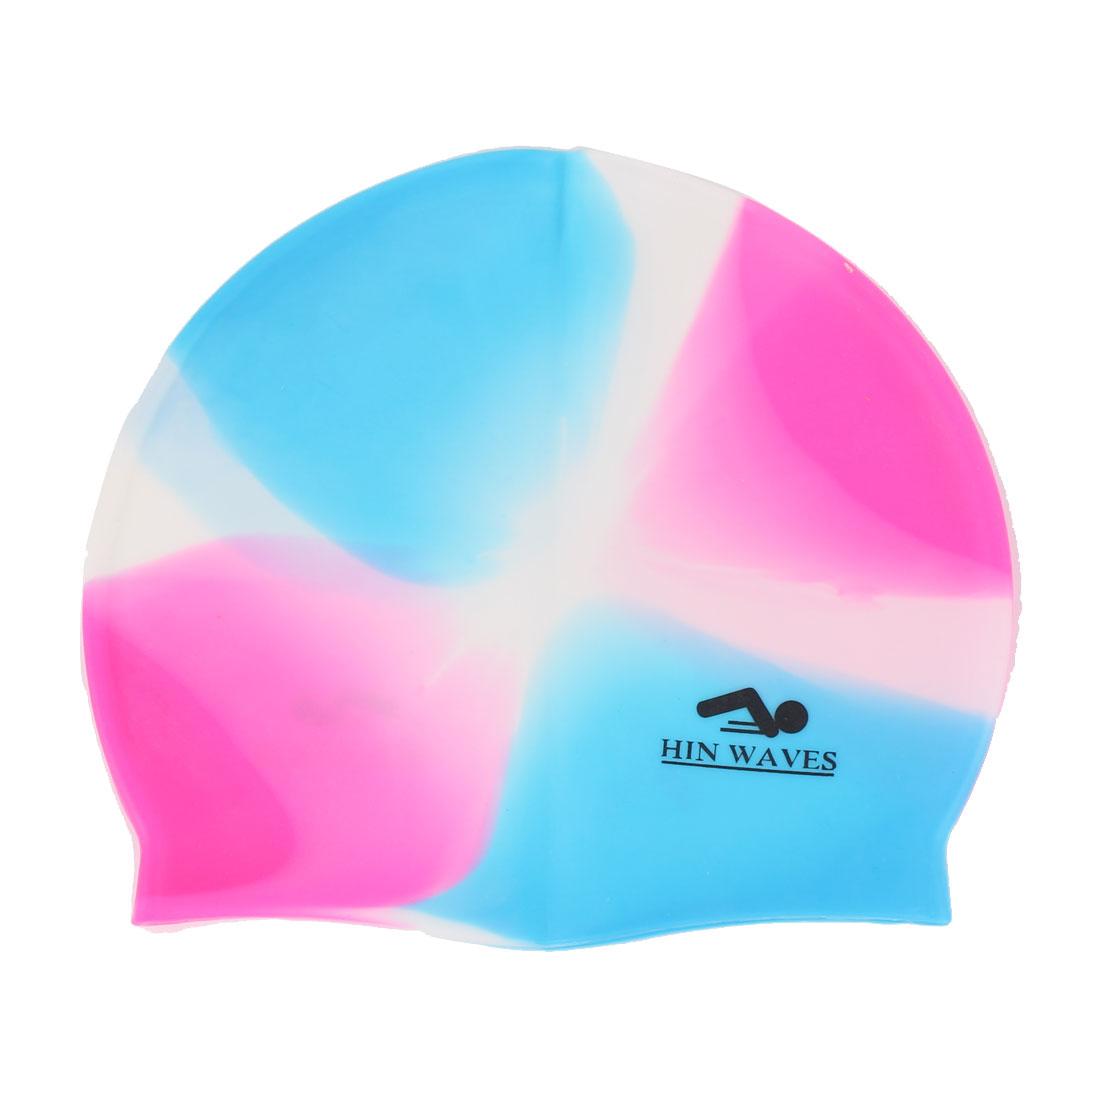 Unisex Summer Silicone Water Sport Swimming Pool Swim Hat Cap Tricolor